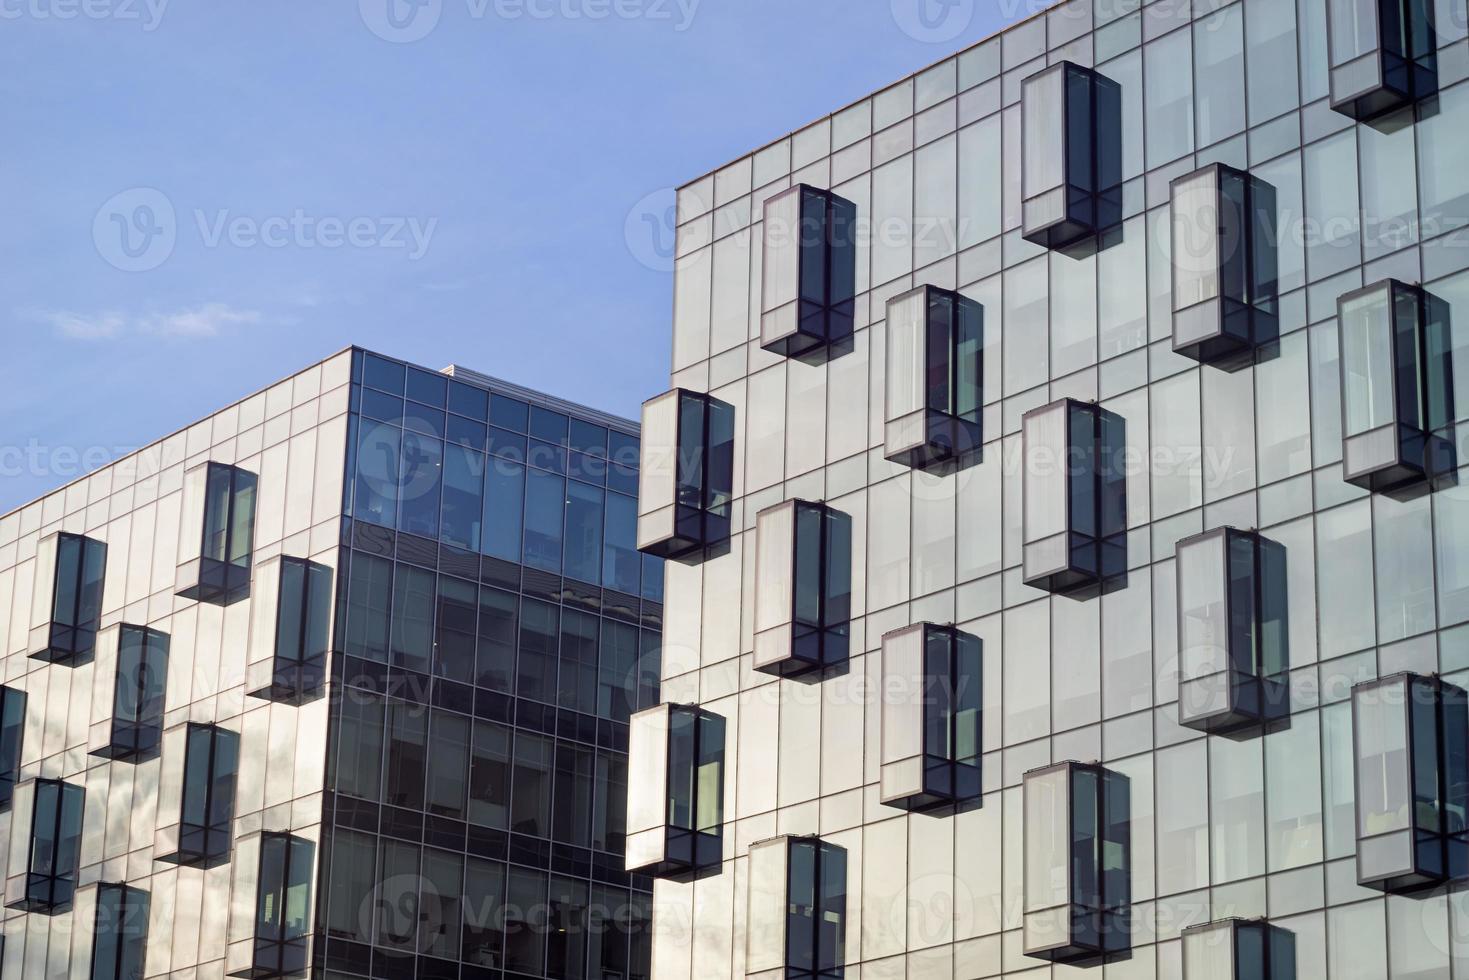 edificios de oficinas fachadas de vidrio foto